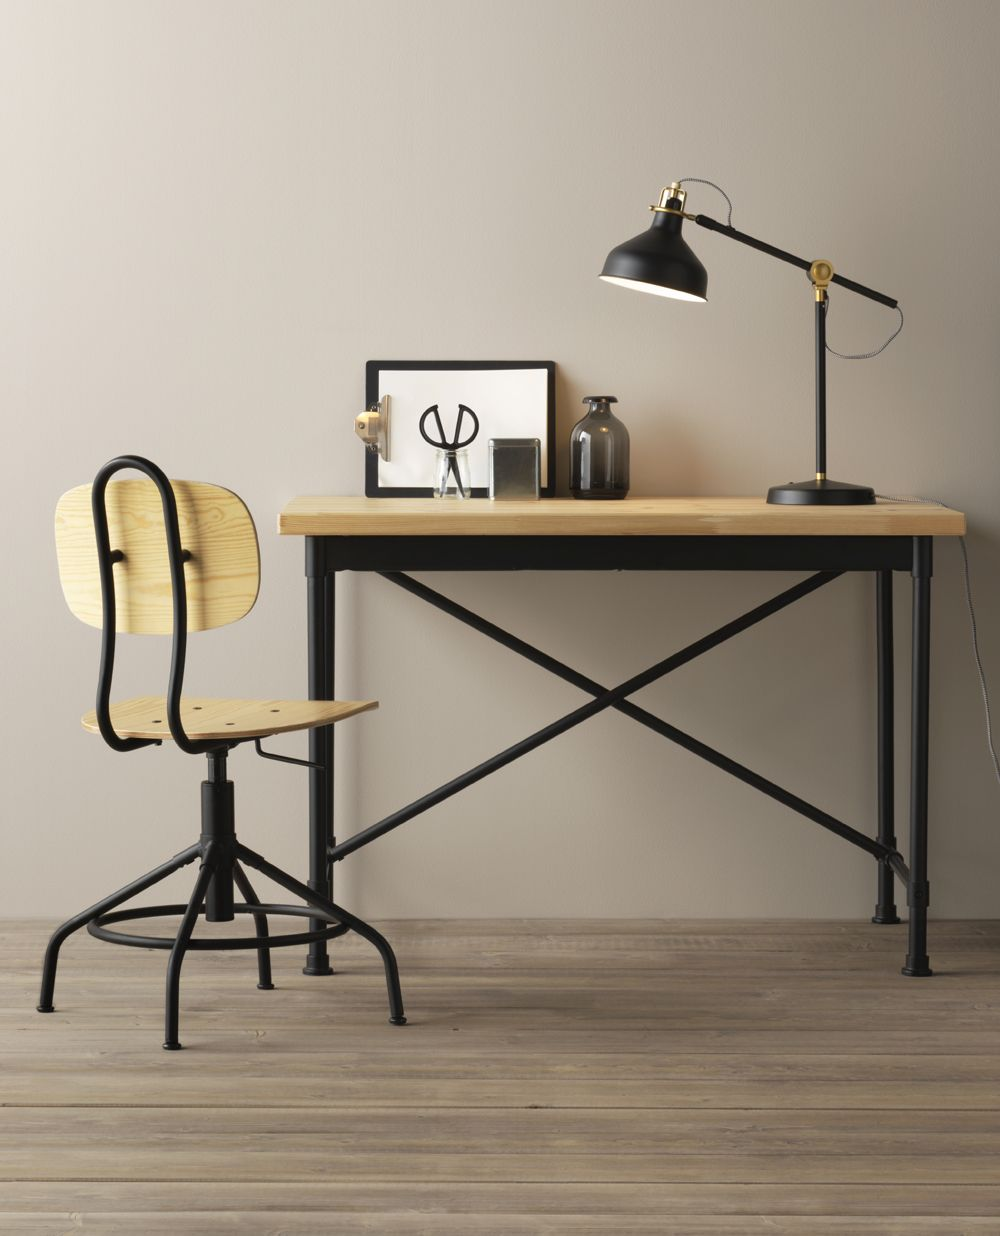 In anteprima il nuovo catalogo IKEA 2017 Desks Ikea inspiration